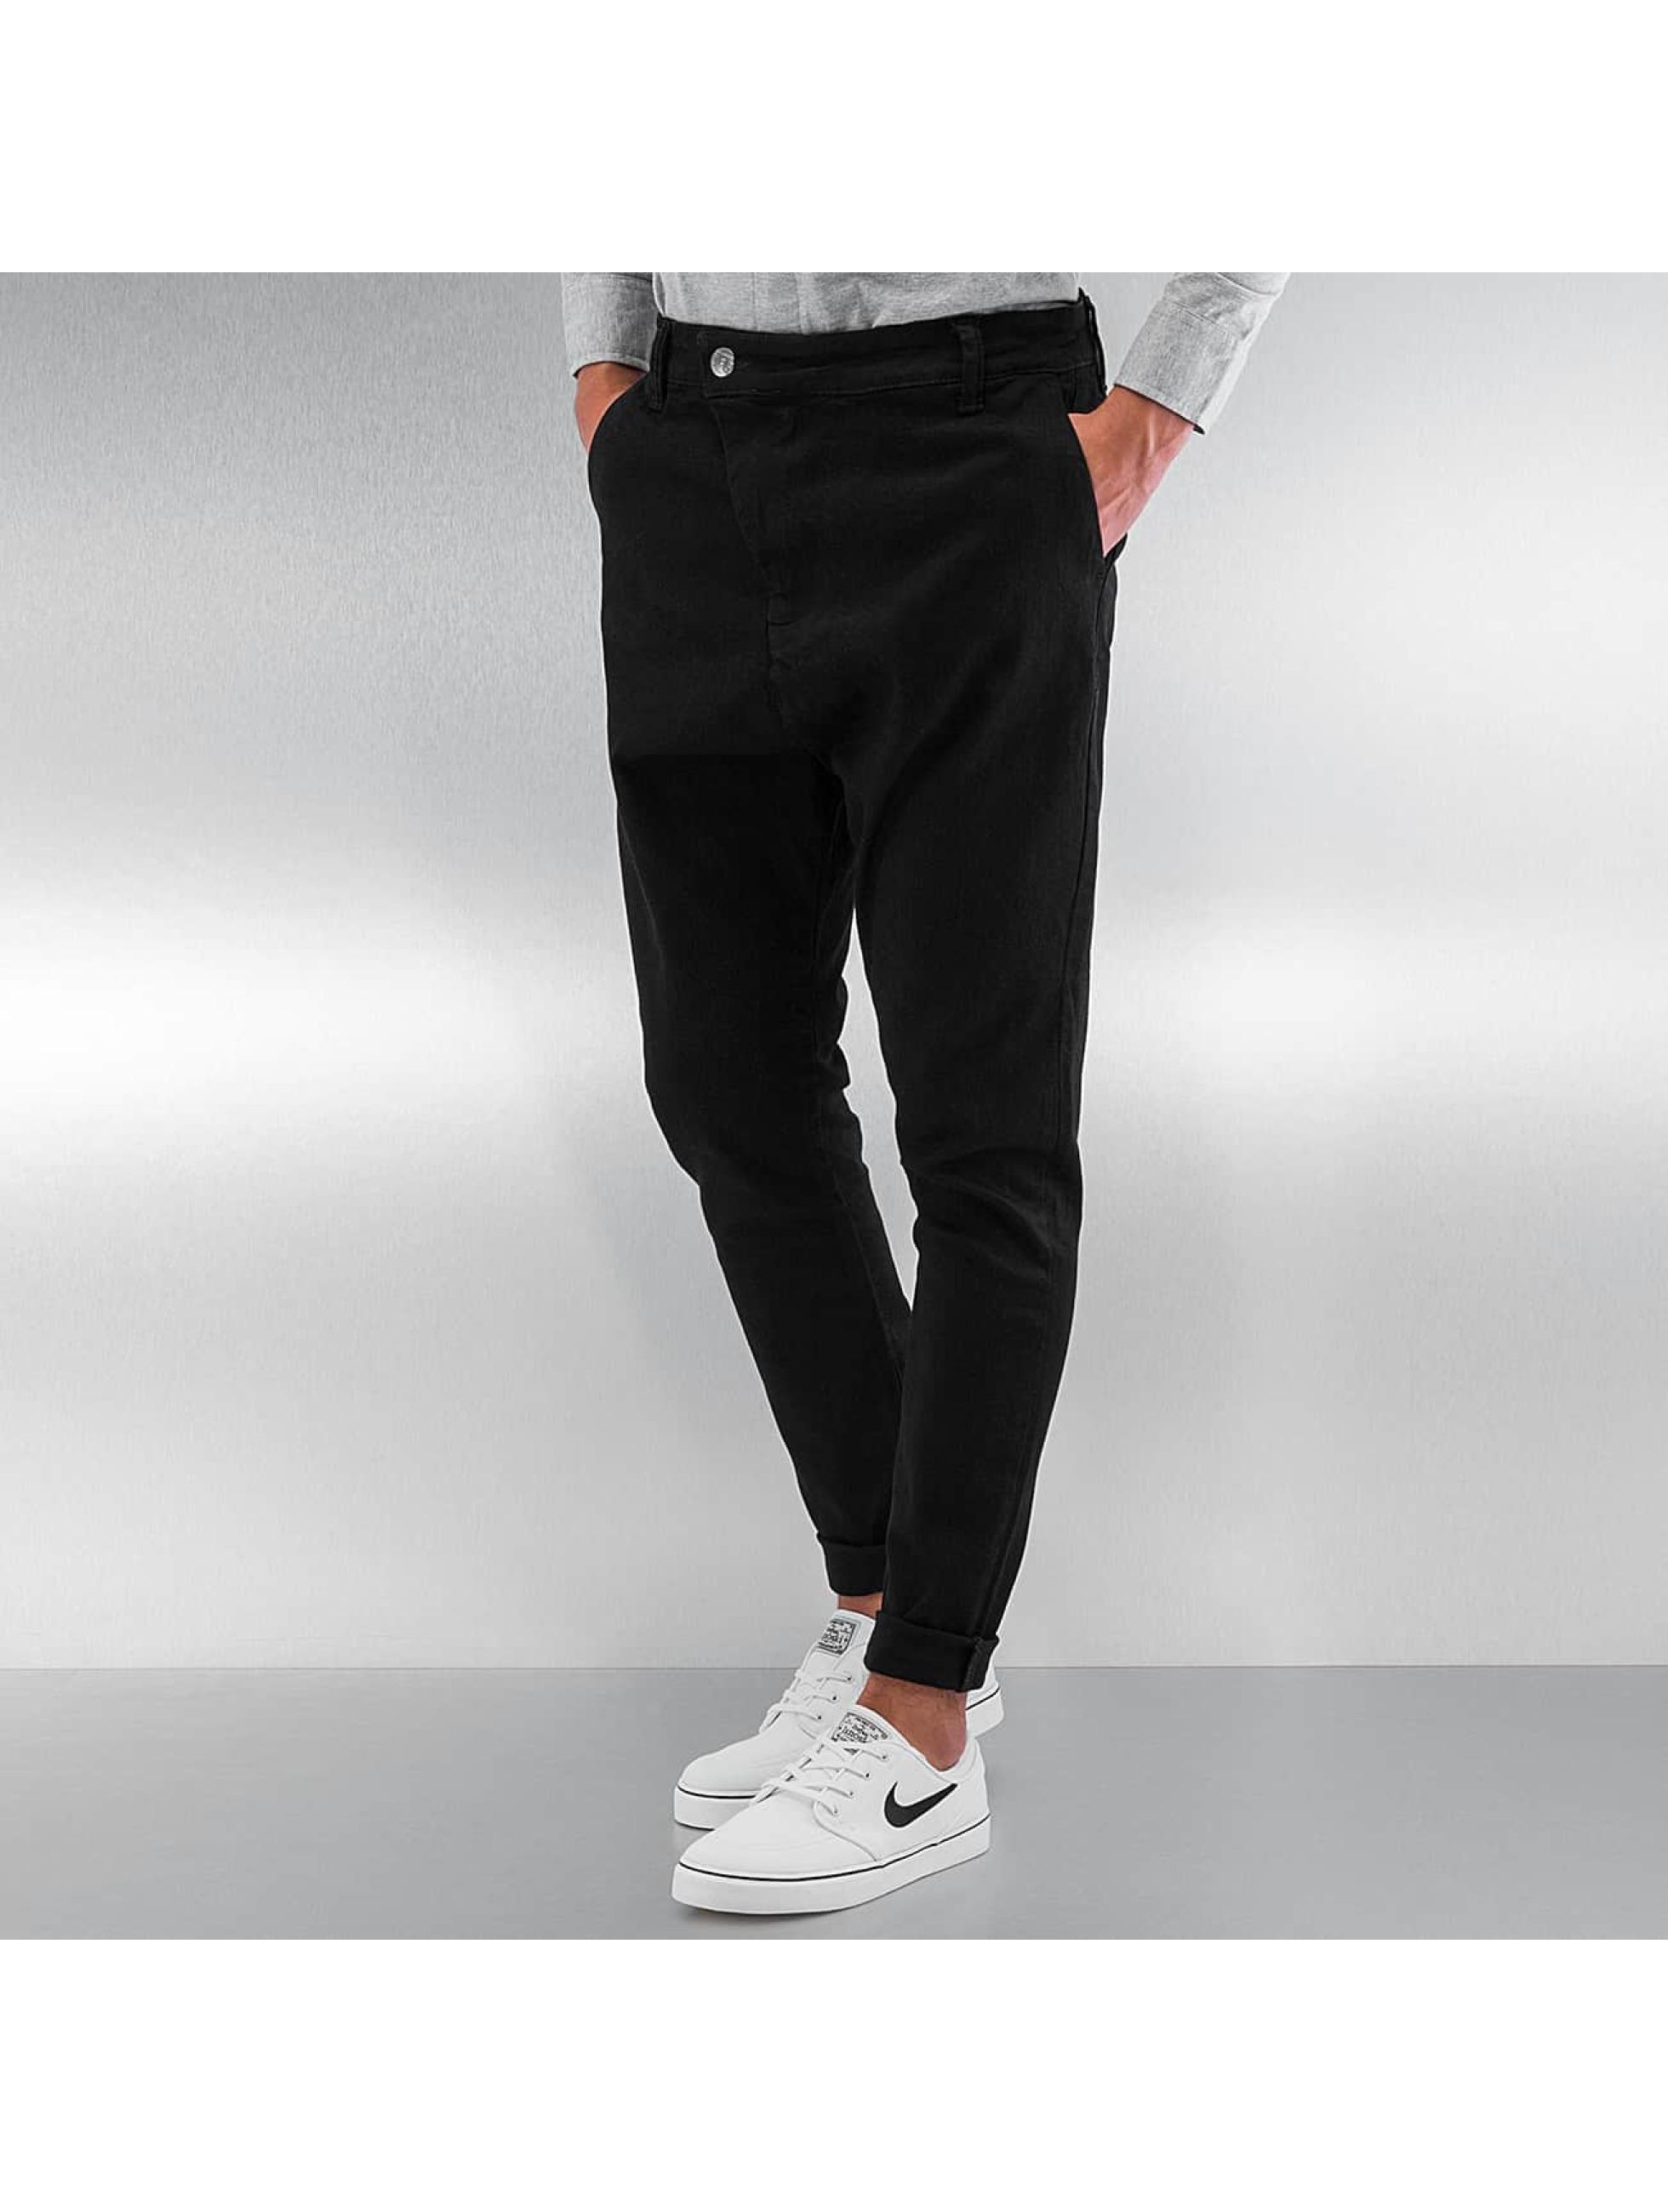 def antifit noir homme pantalon chino 296873. Black Bedroom Furniture Sets. Home Design Ideas